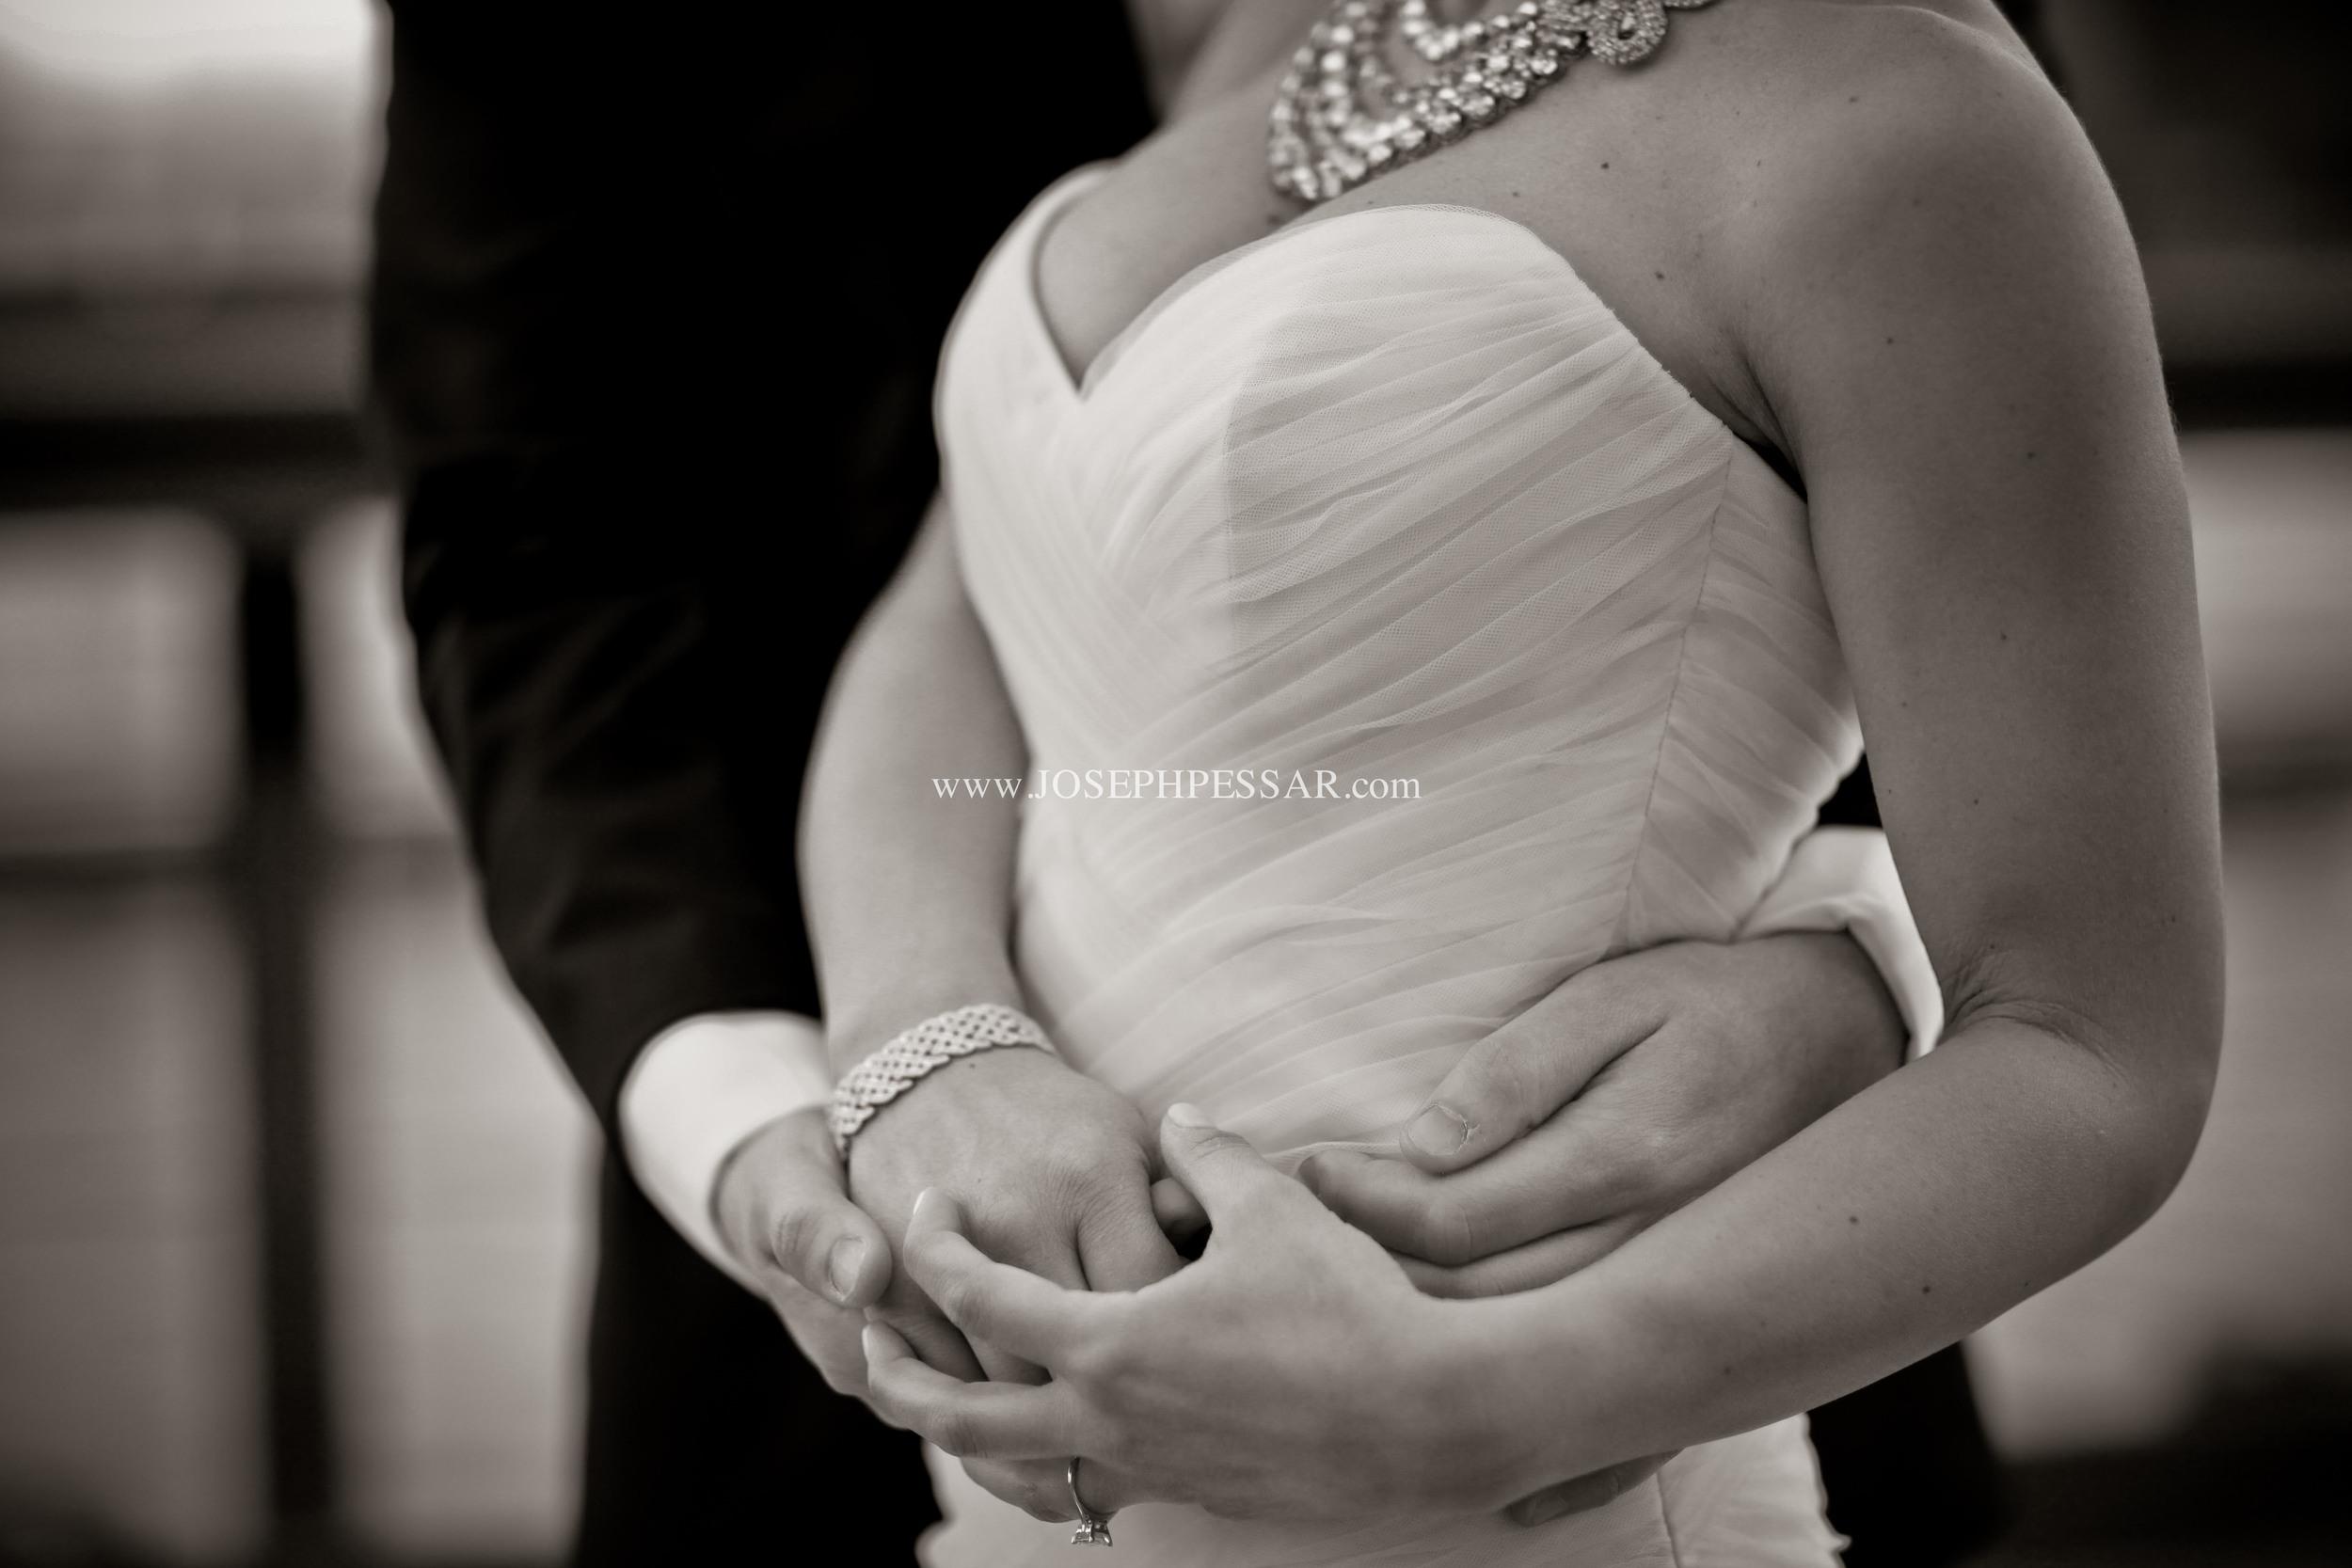 nyc_wedding_photographer0022.jpg